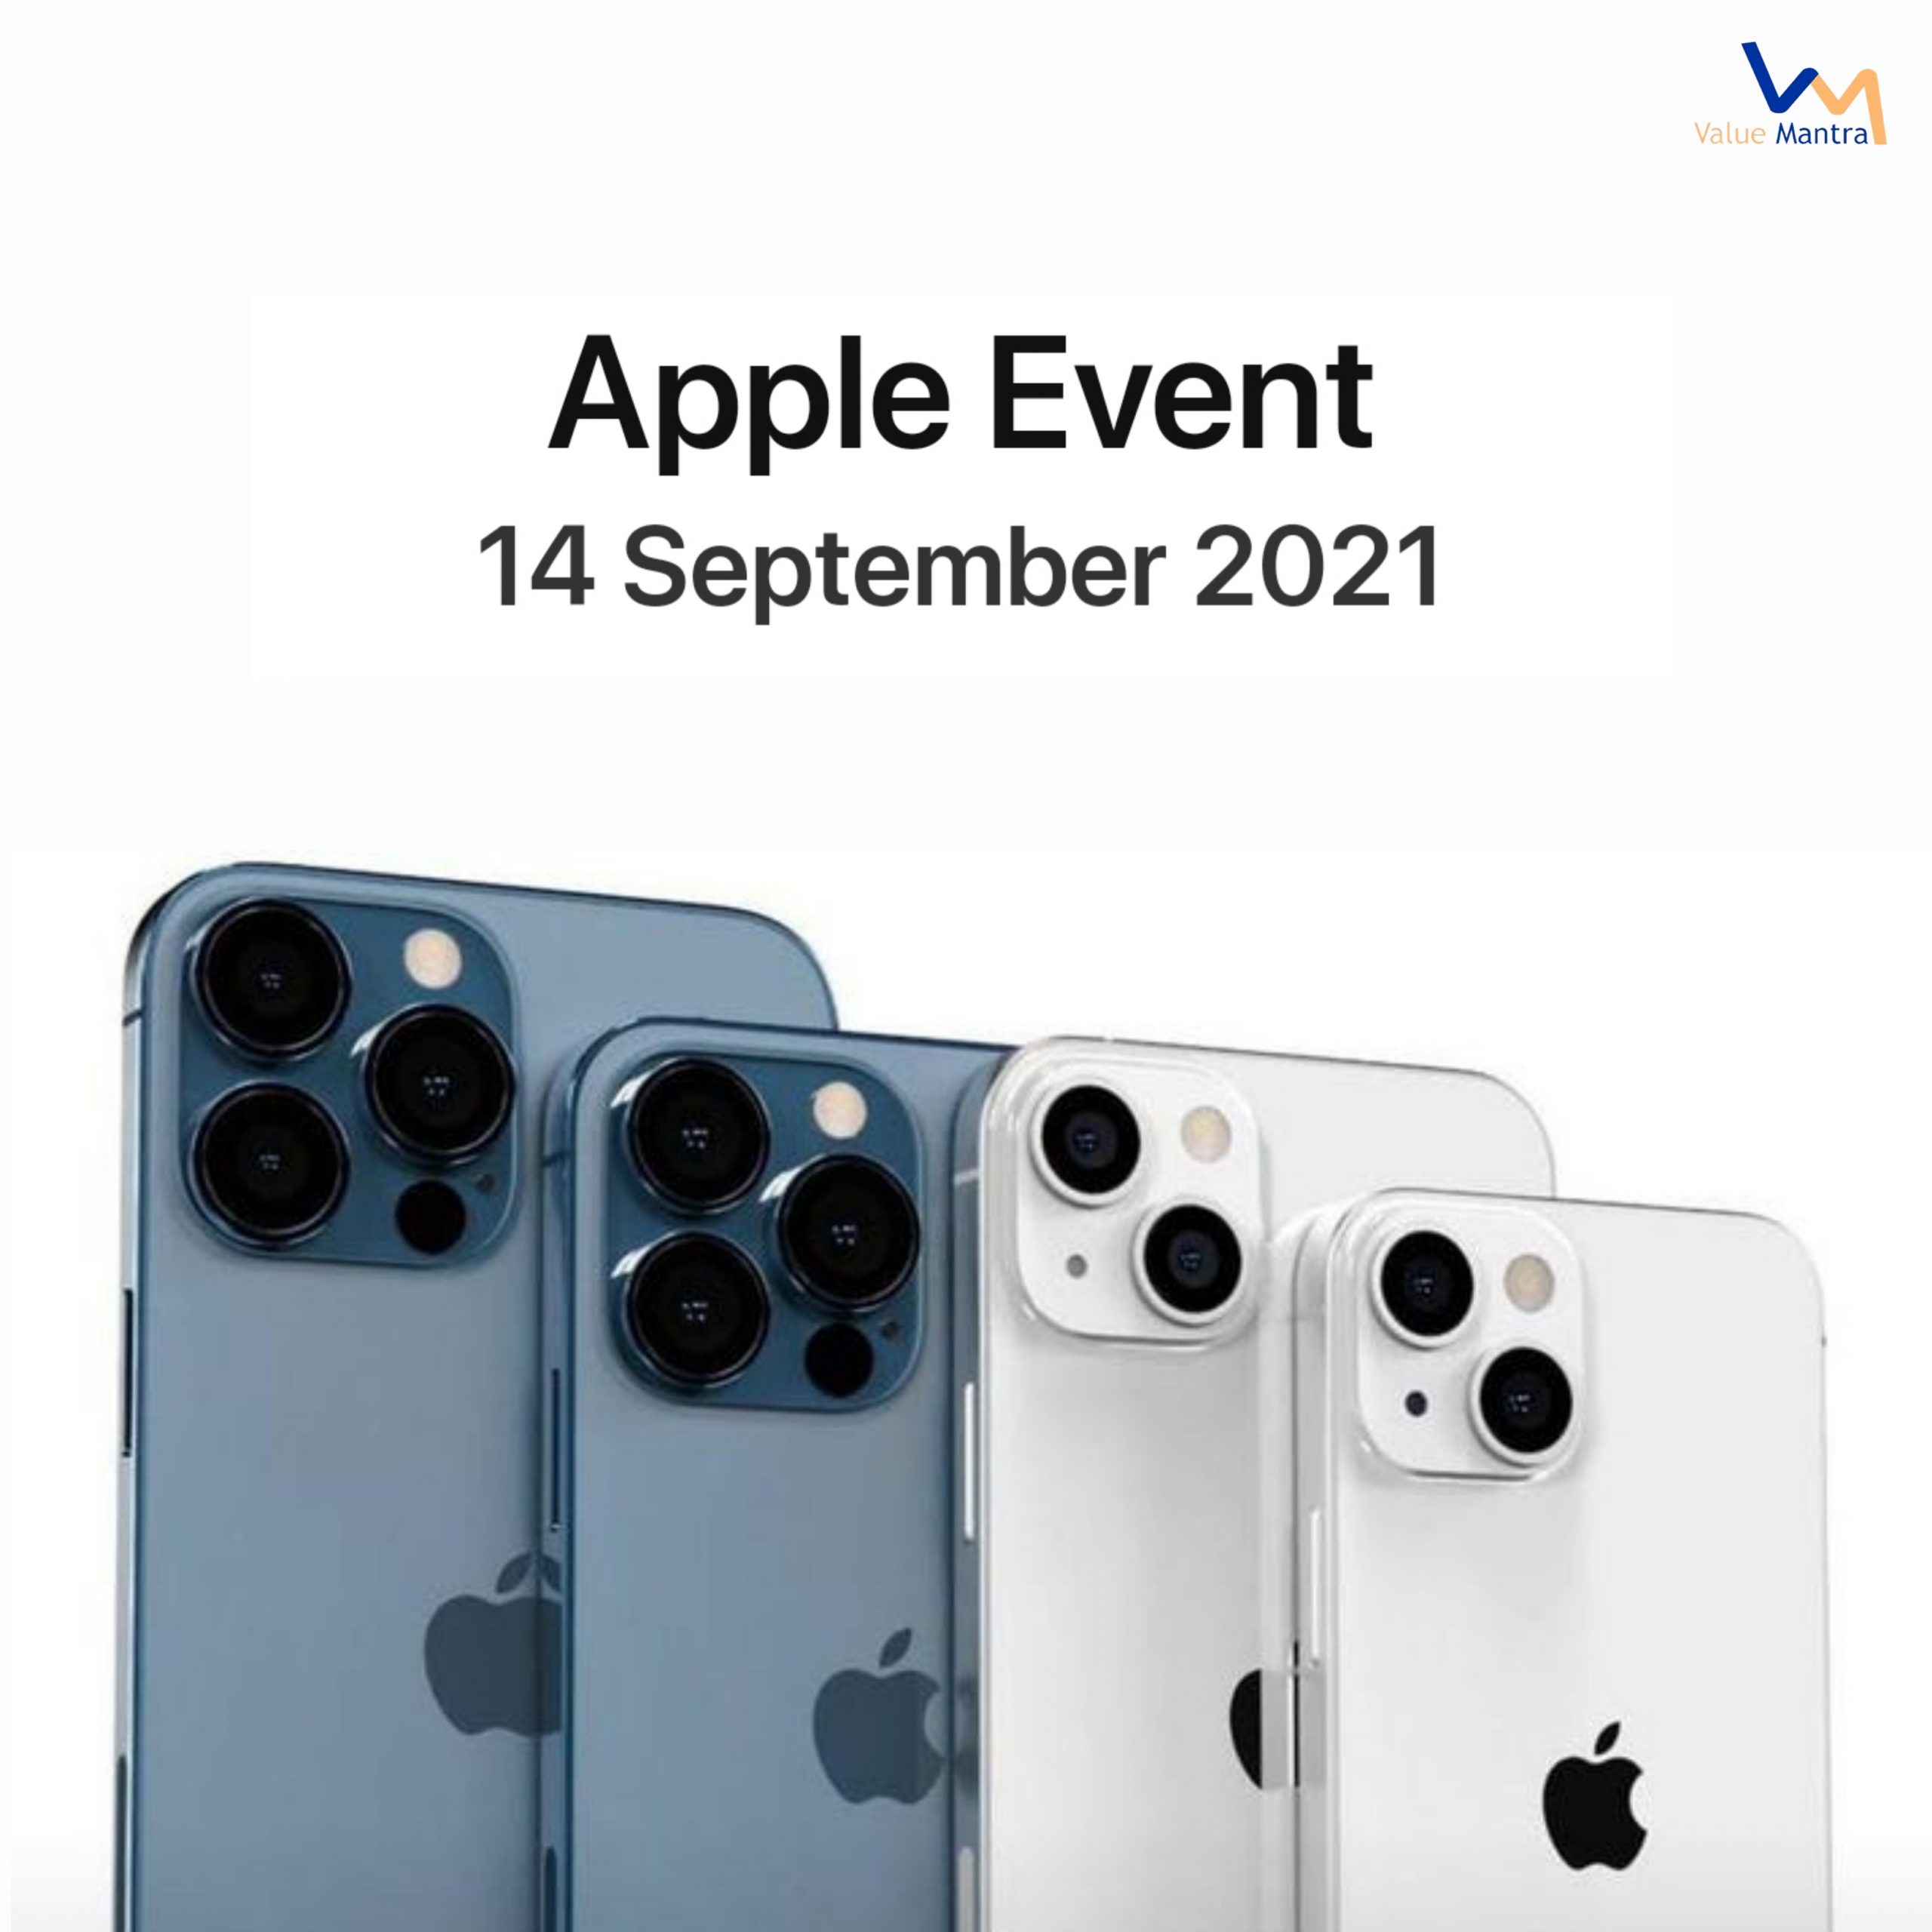 Apple iPhone 13 – Apple's Launch Event Details